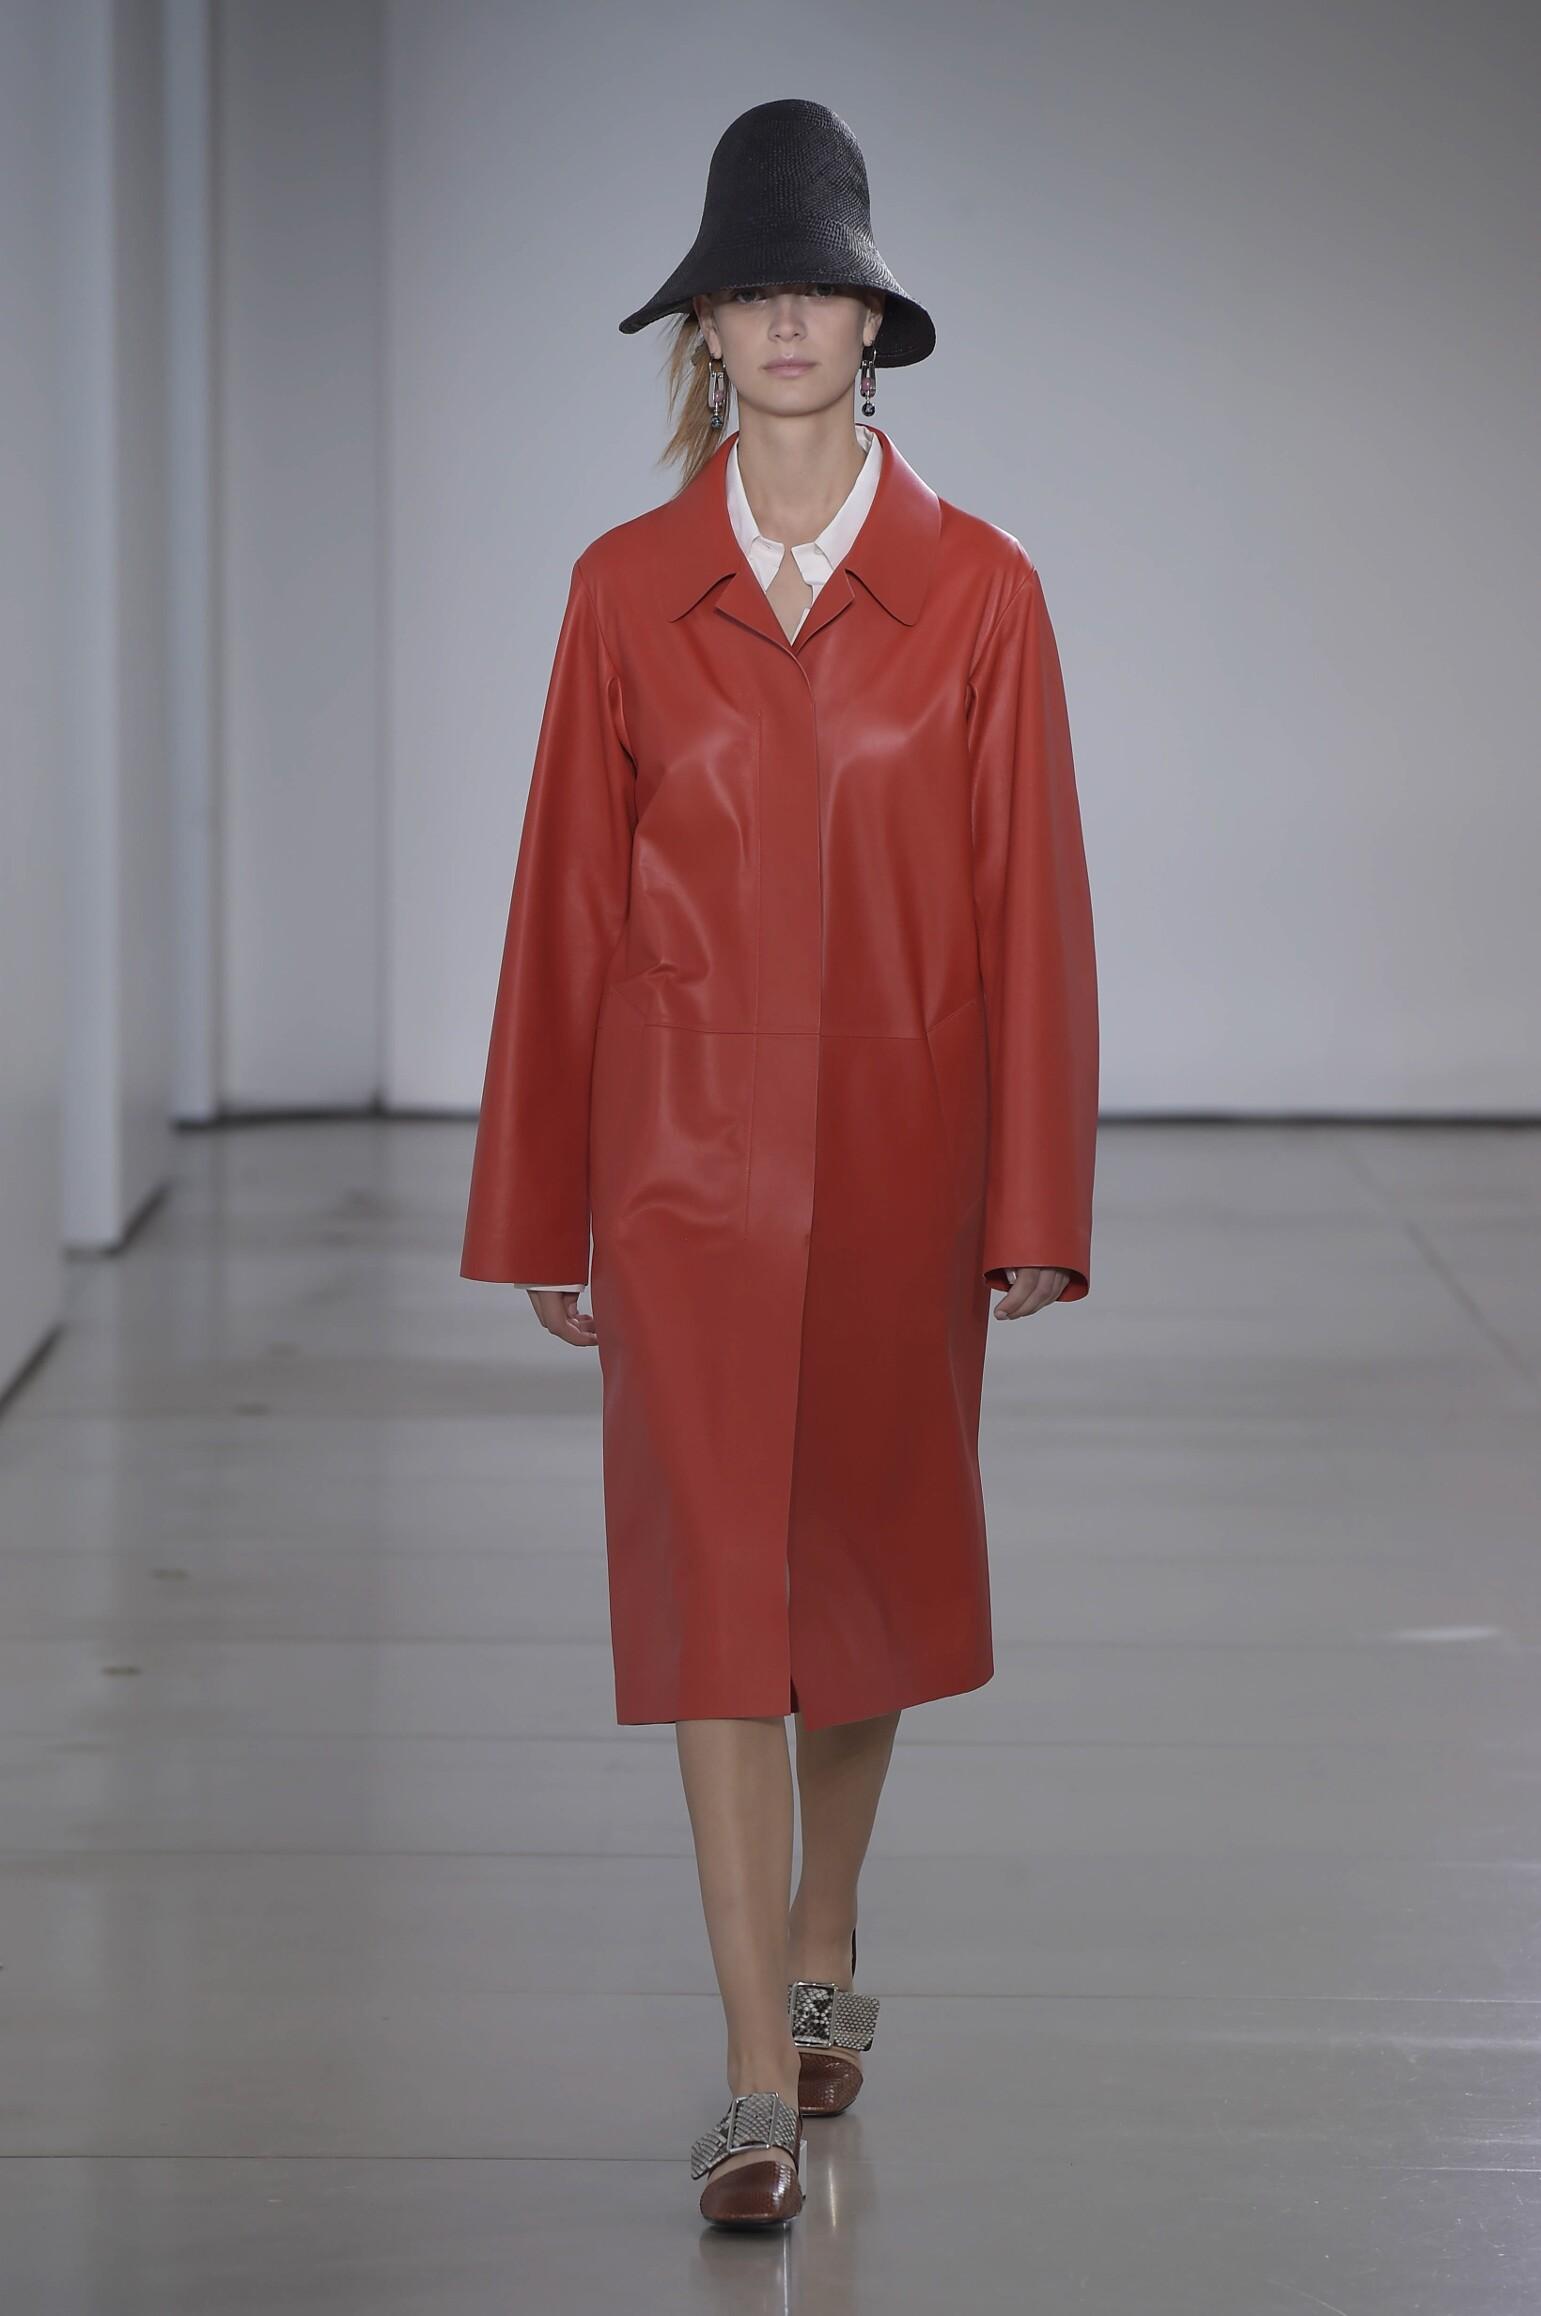 Fashion Model Jil Sander Catwalk